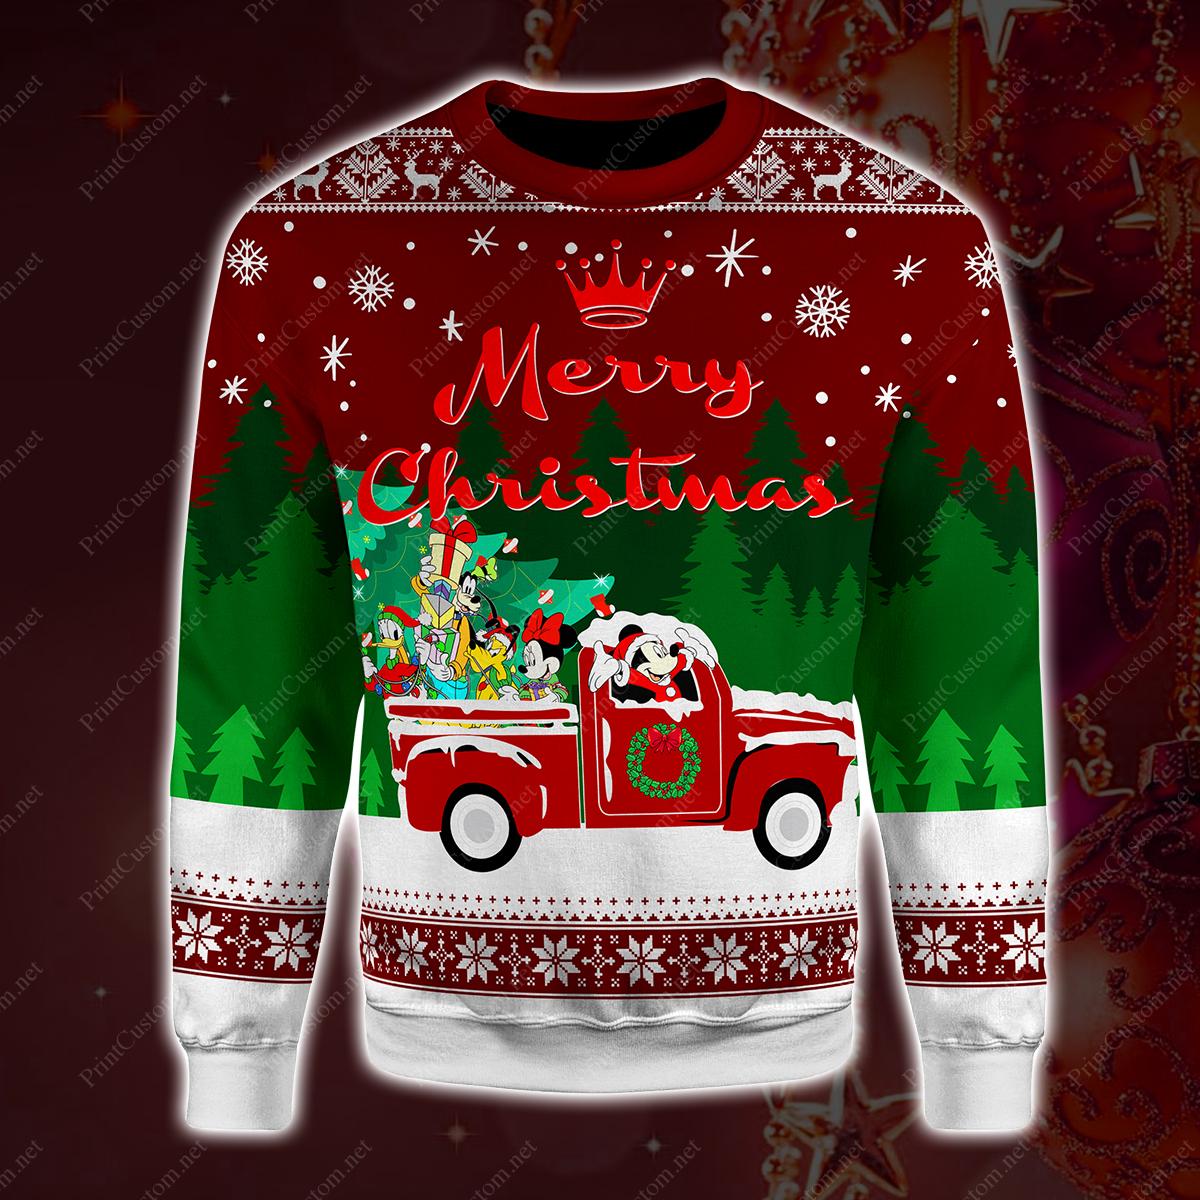 Disney characters merry christmas hallmark movies full printing shirt 1